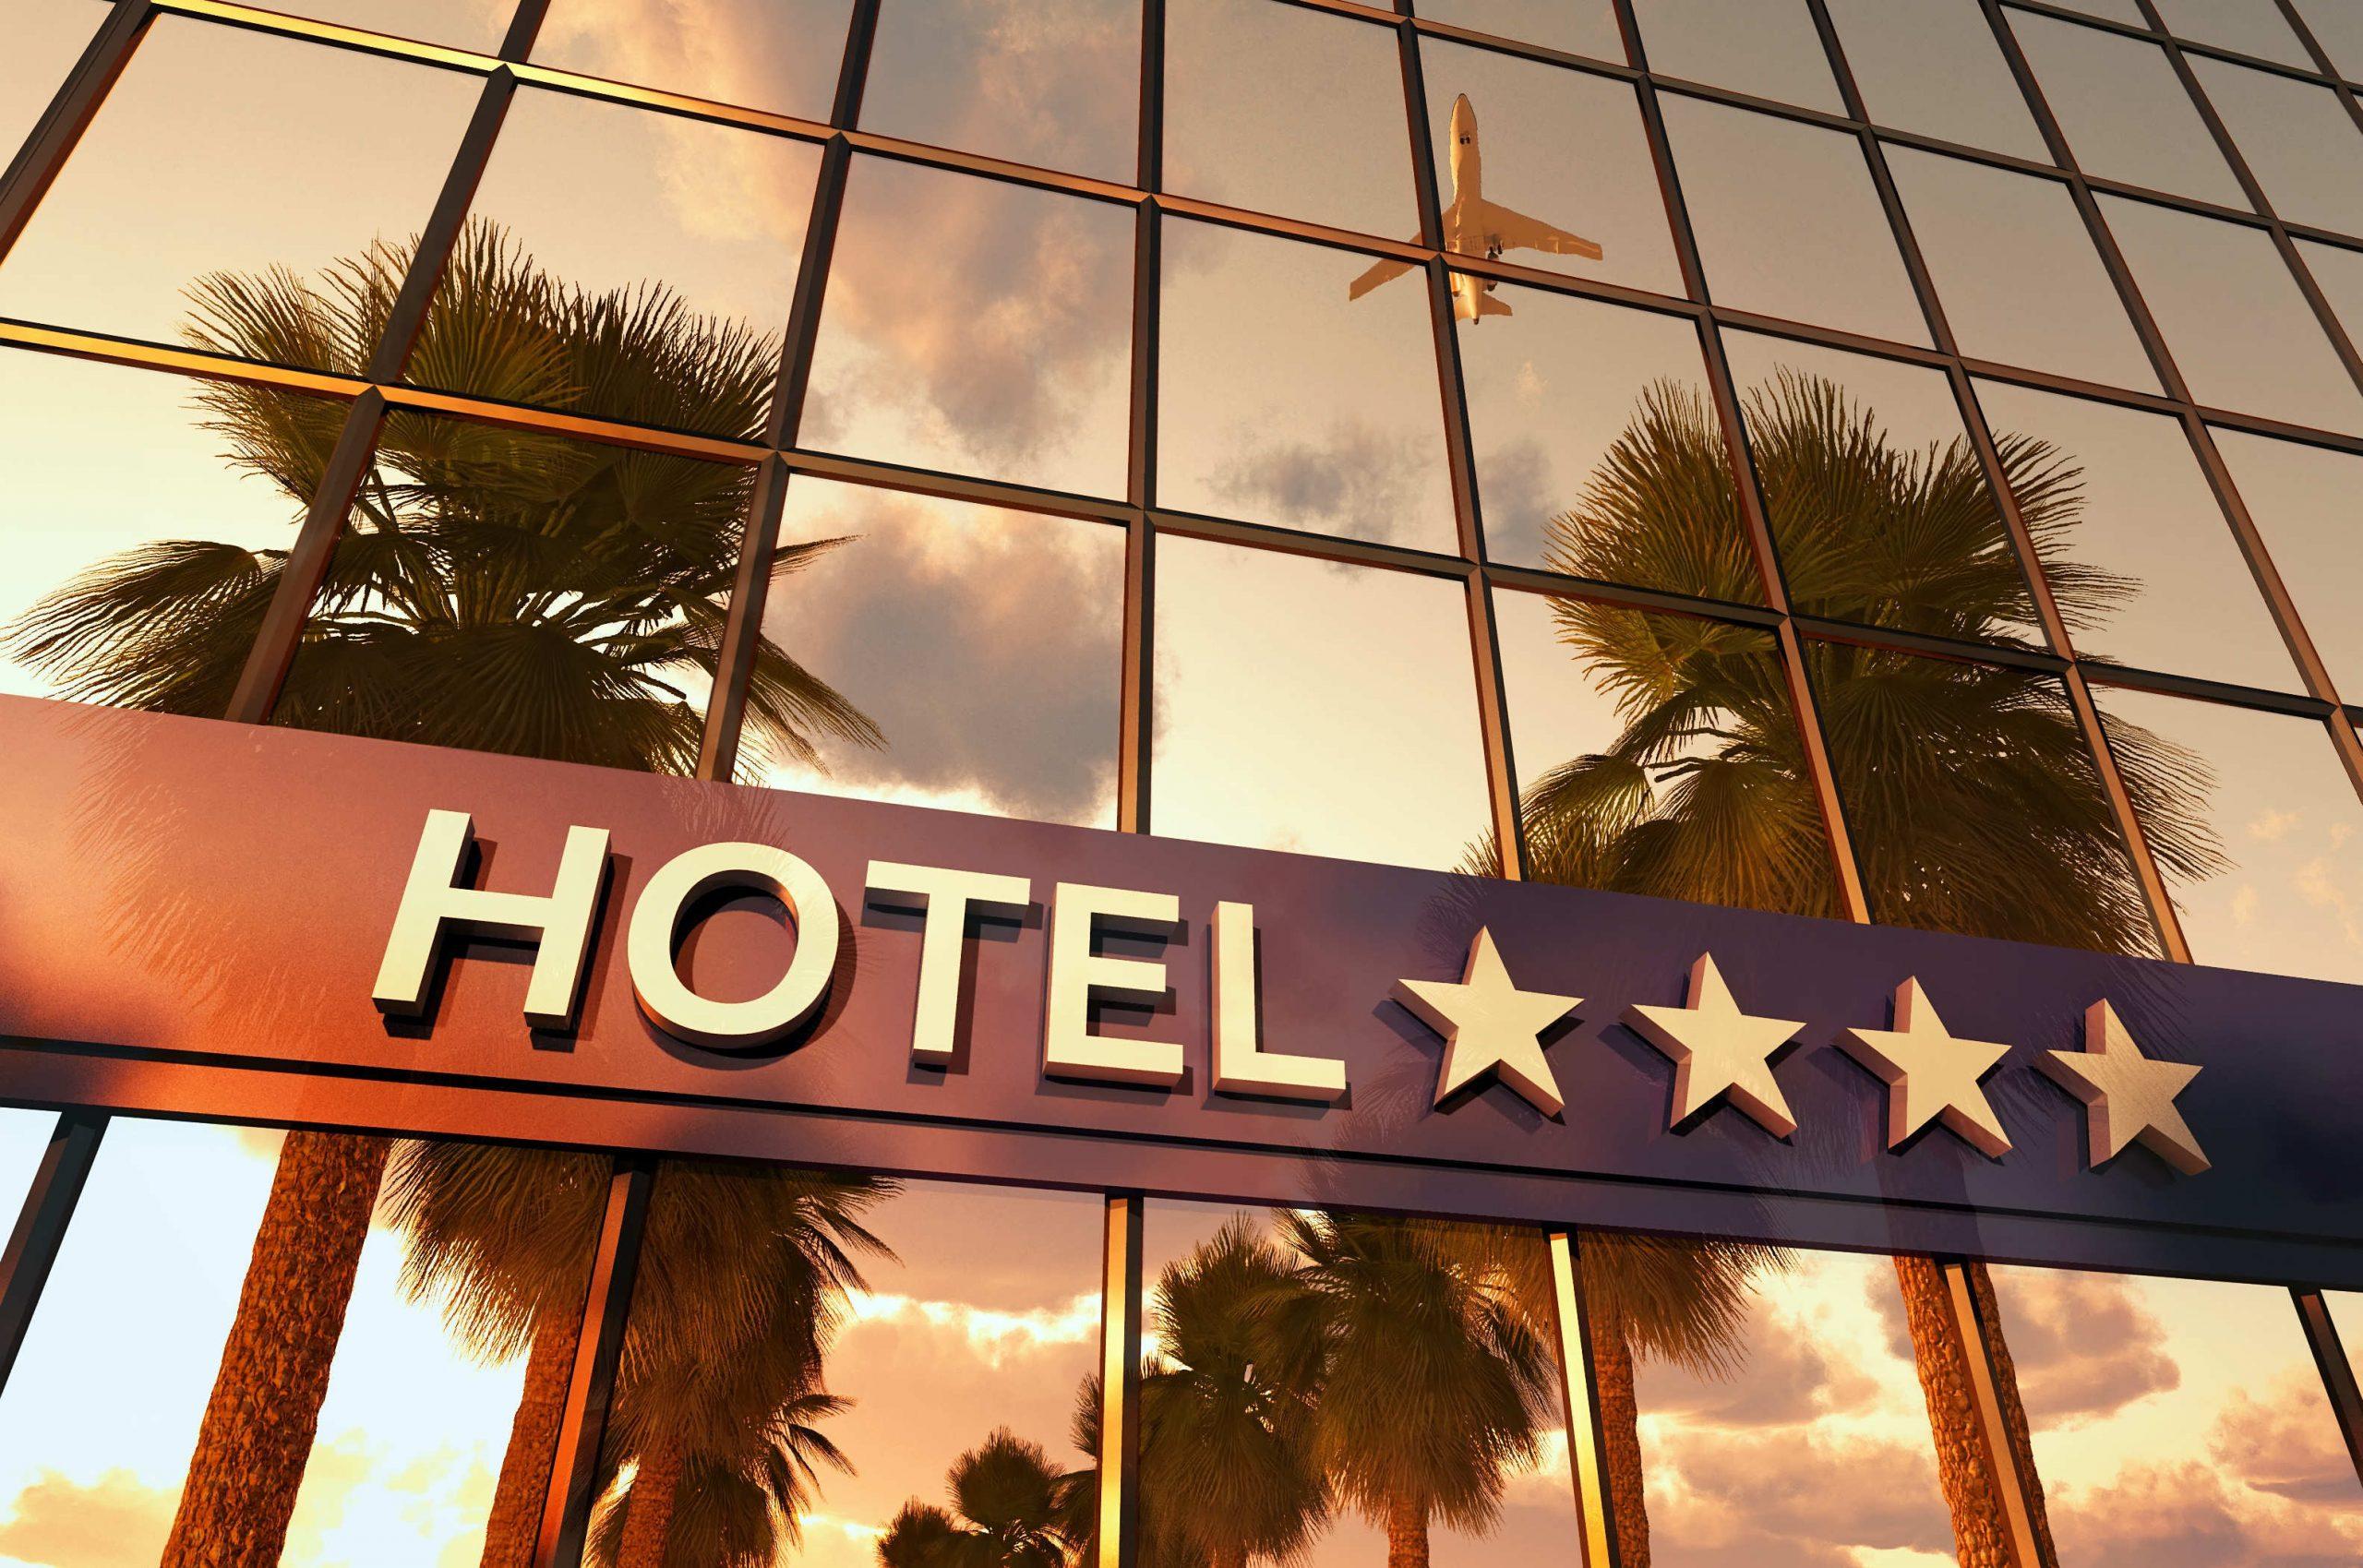 Hoteles, ¿Cómo se clasifican?